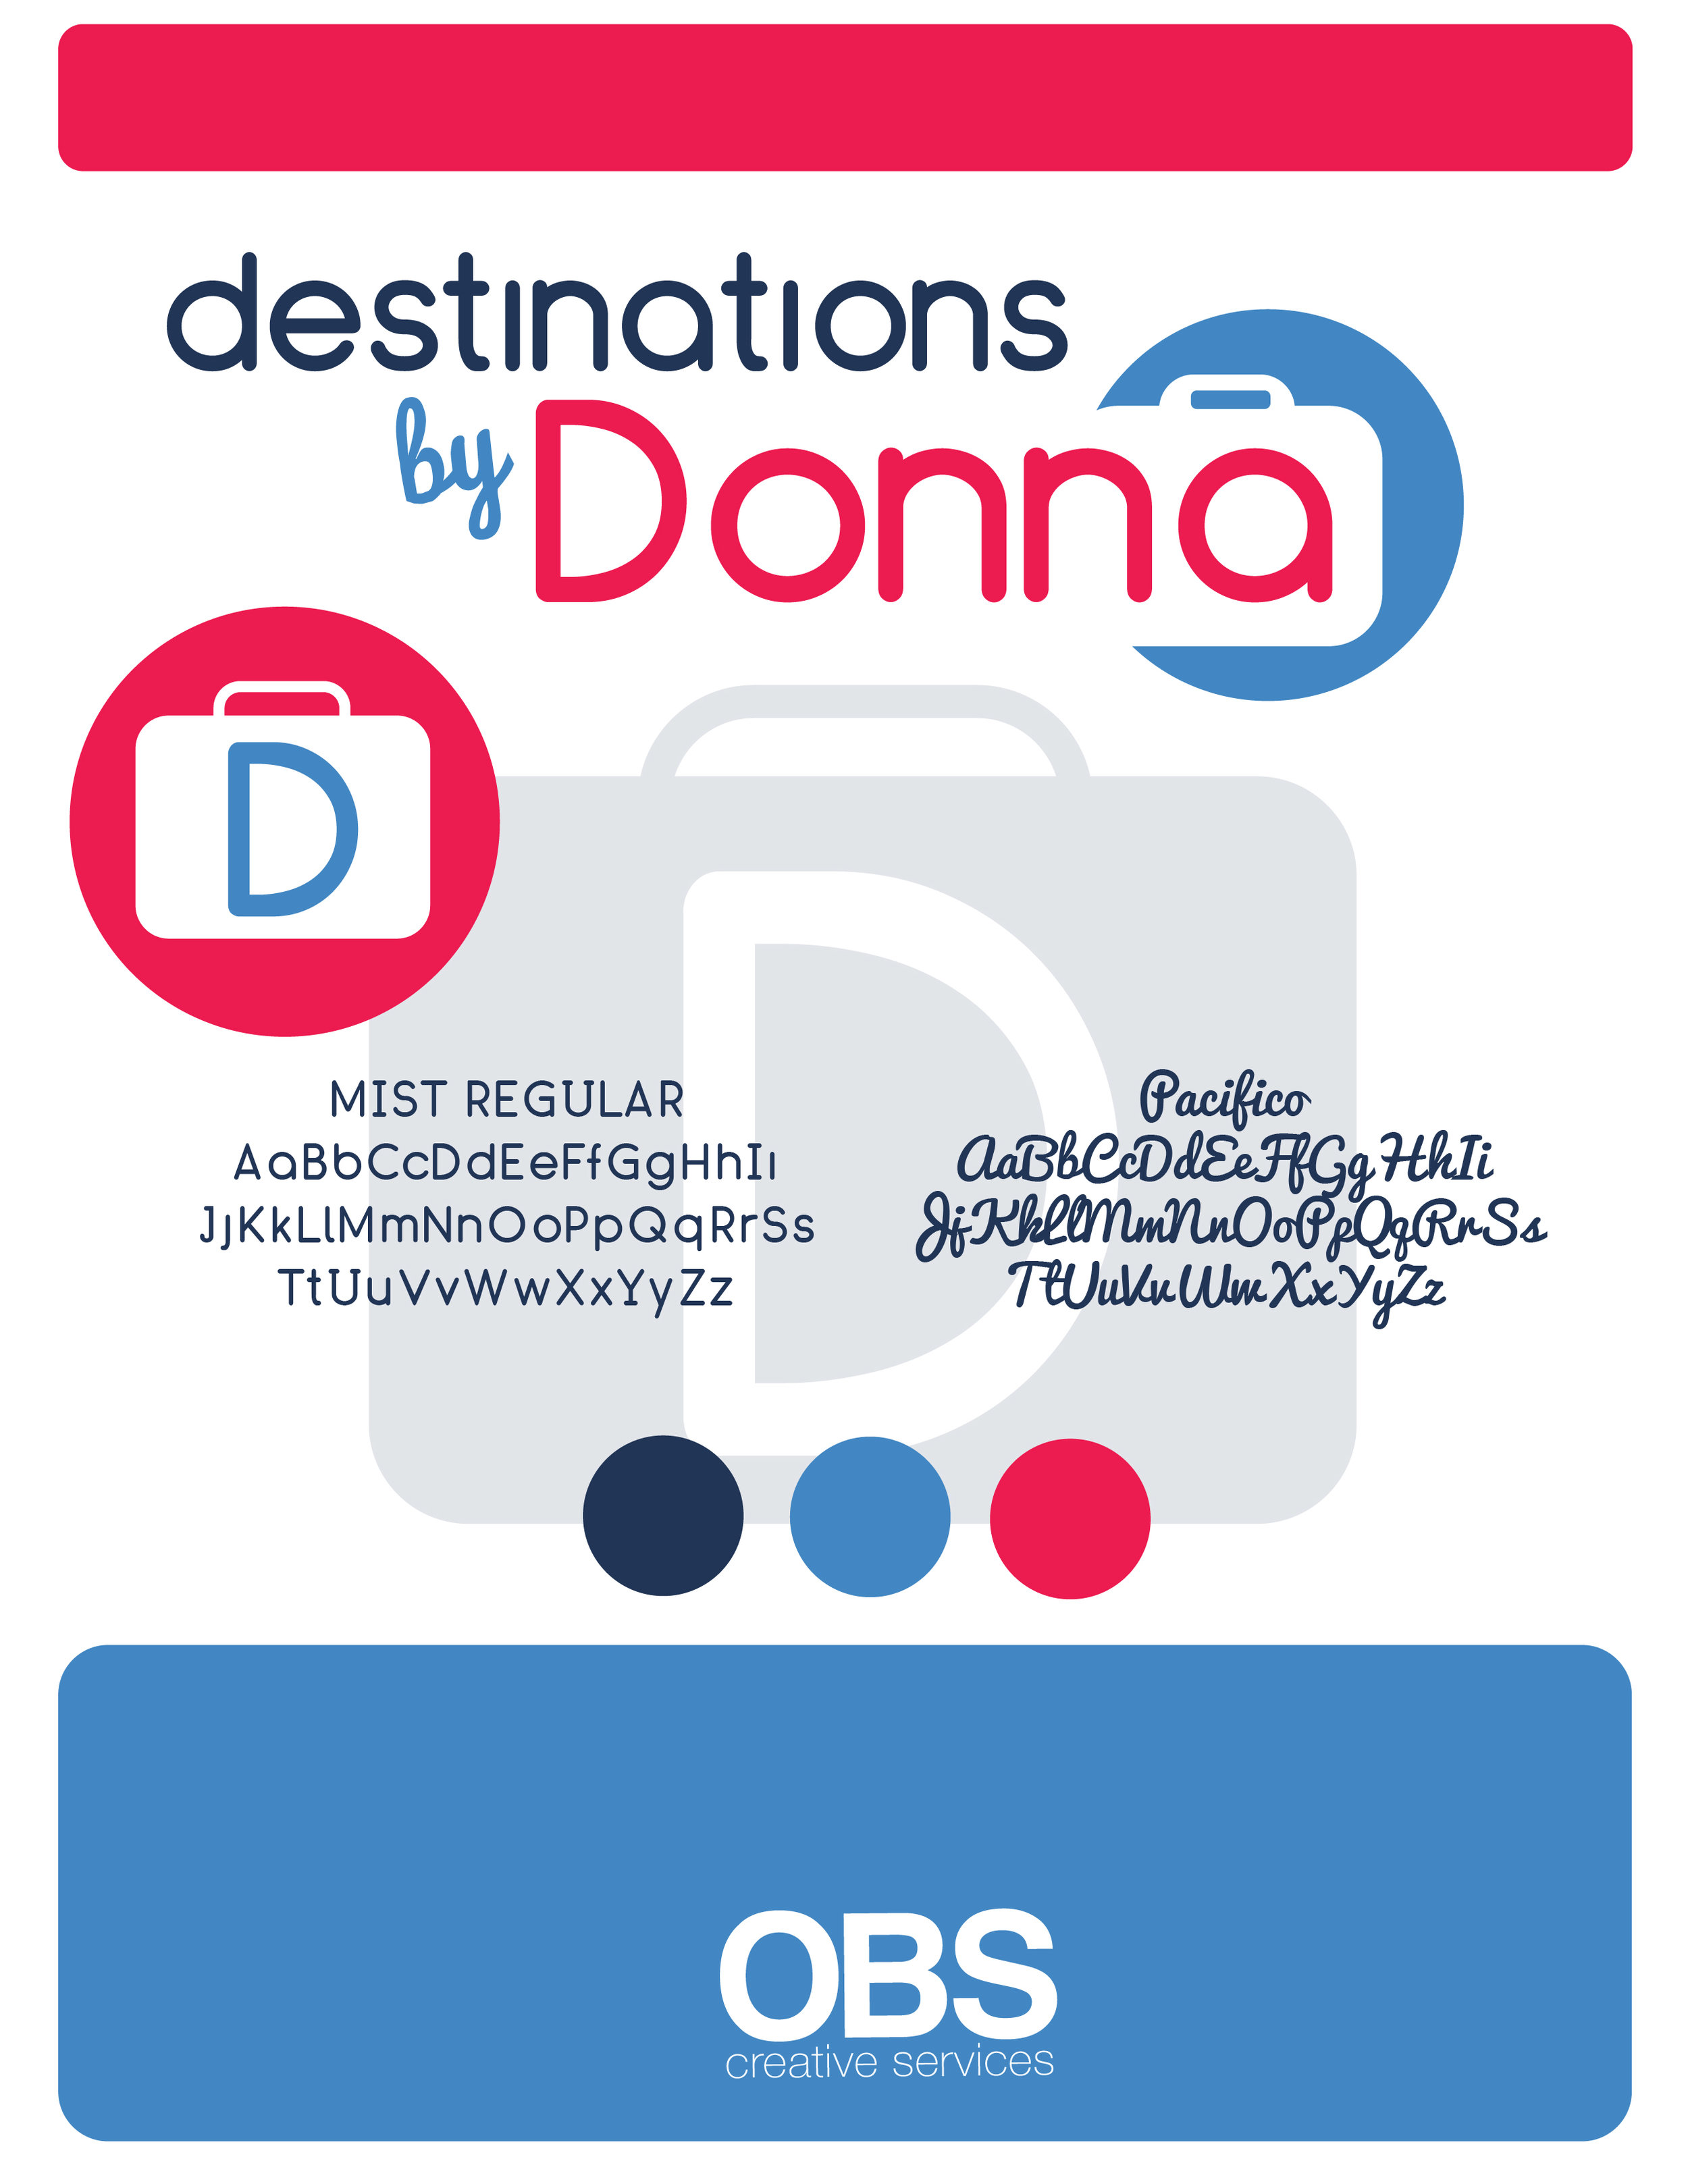 MCB Recruit CardDestinations by Donna.jpg